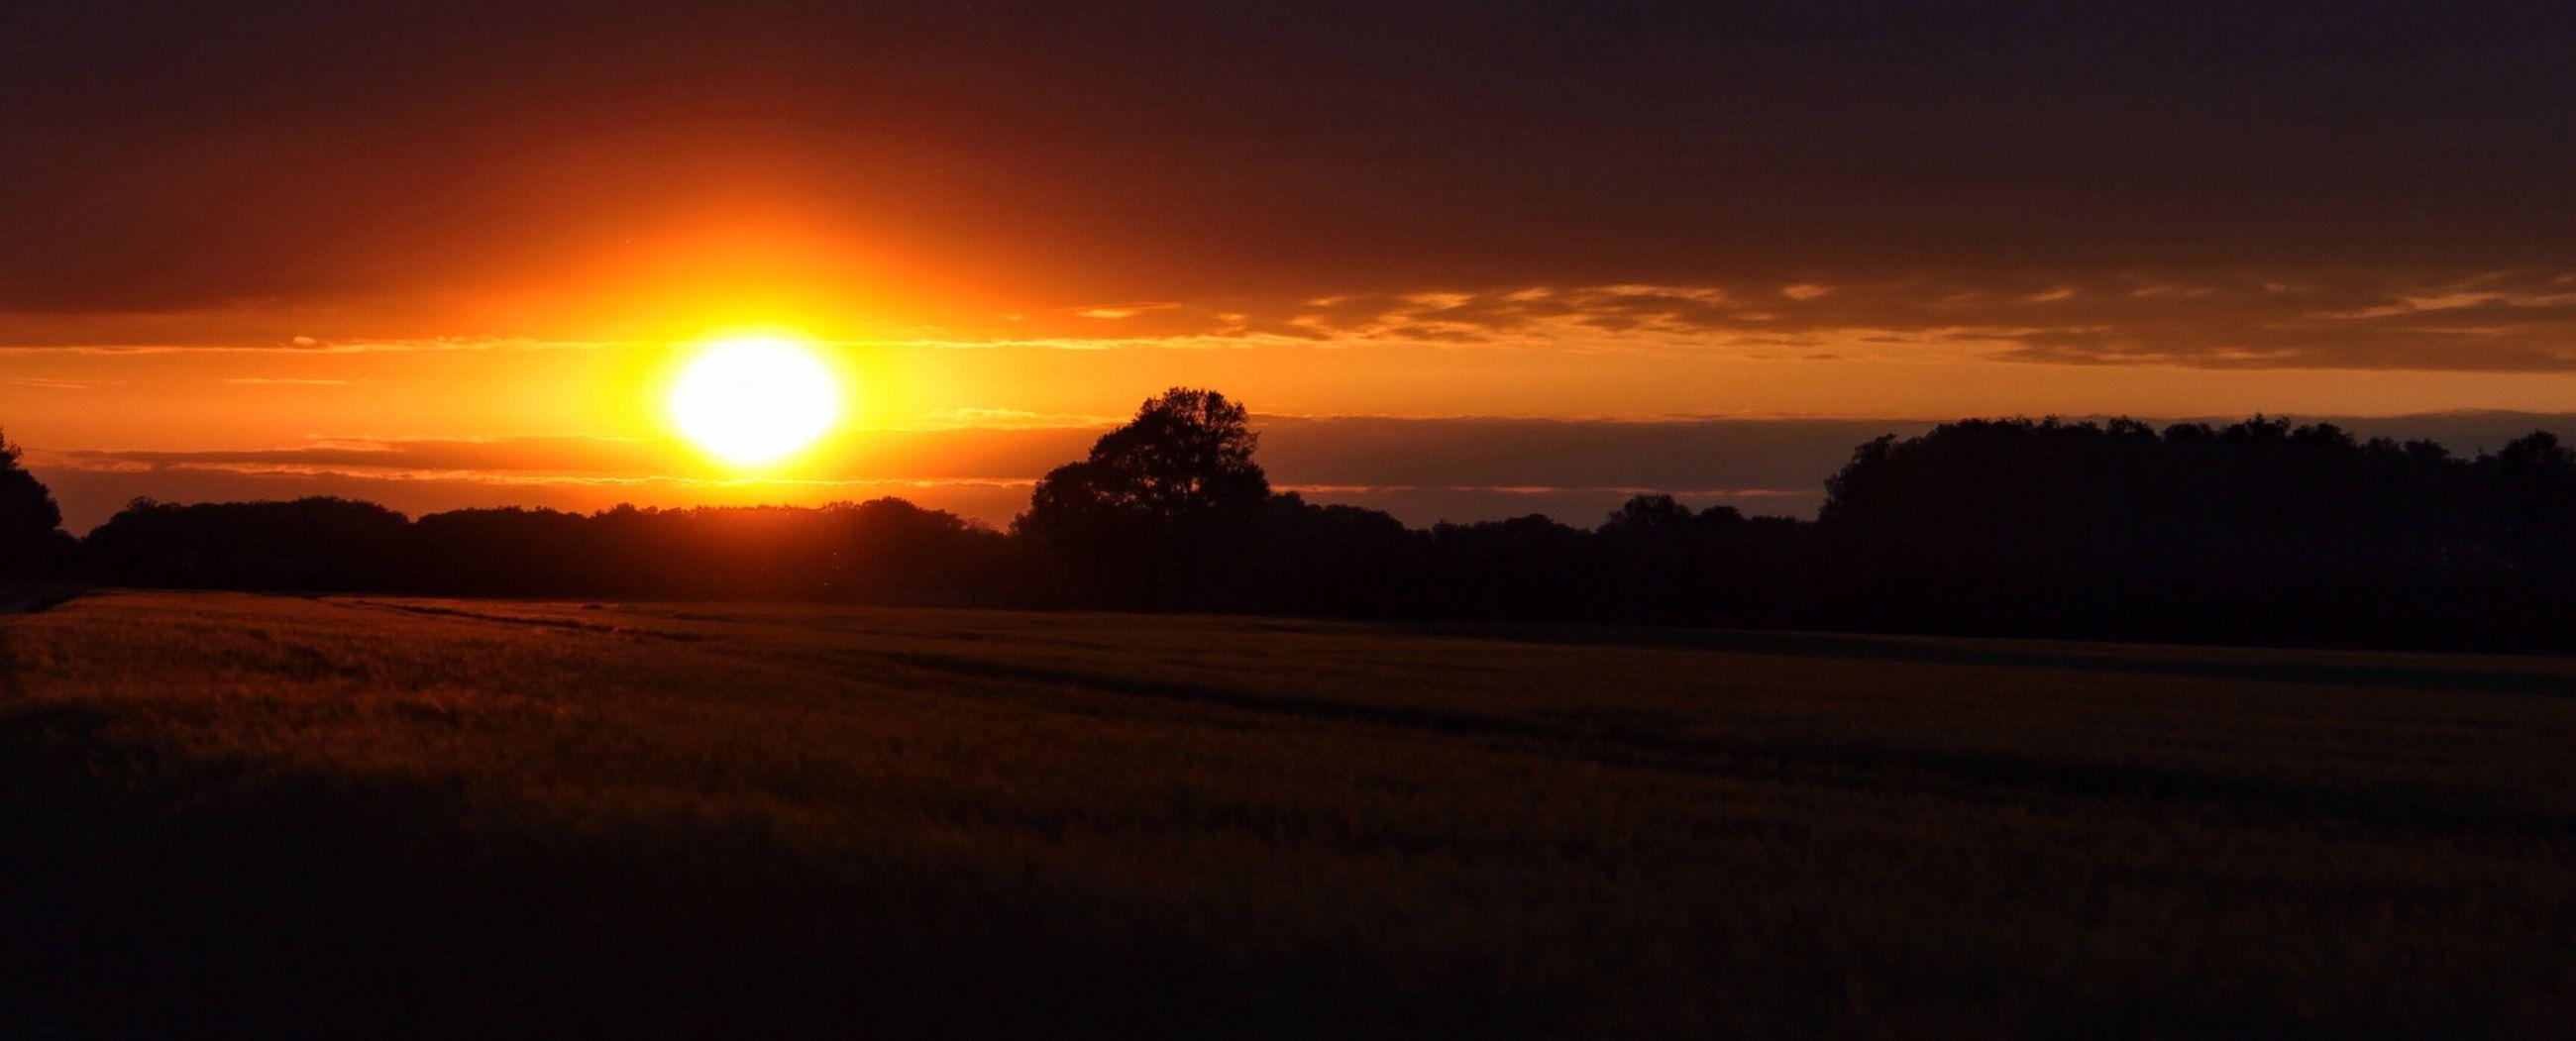 sunset, landscape, tranquil scene, tranquility, scenics, sky, sun, beauty in nature, field, silhouette, orange color, nature, idyllic, rural scene, cloud - sky, sunlight, horizon over land, cloud, tree, agriculture